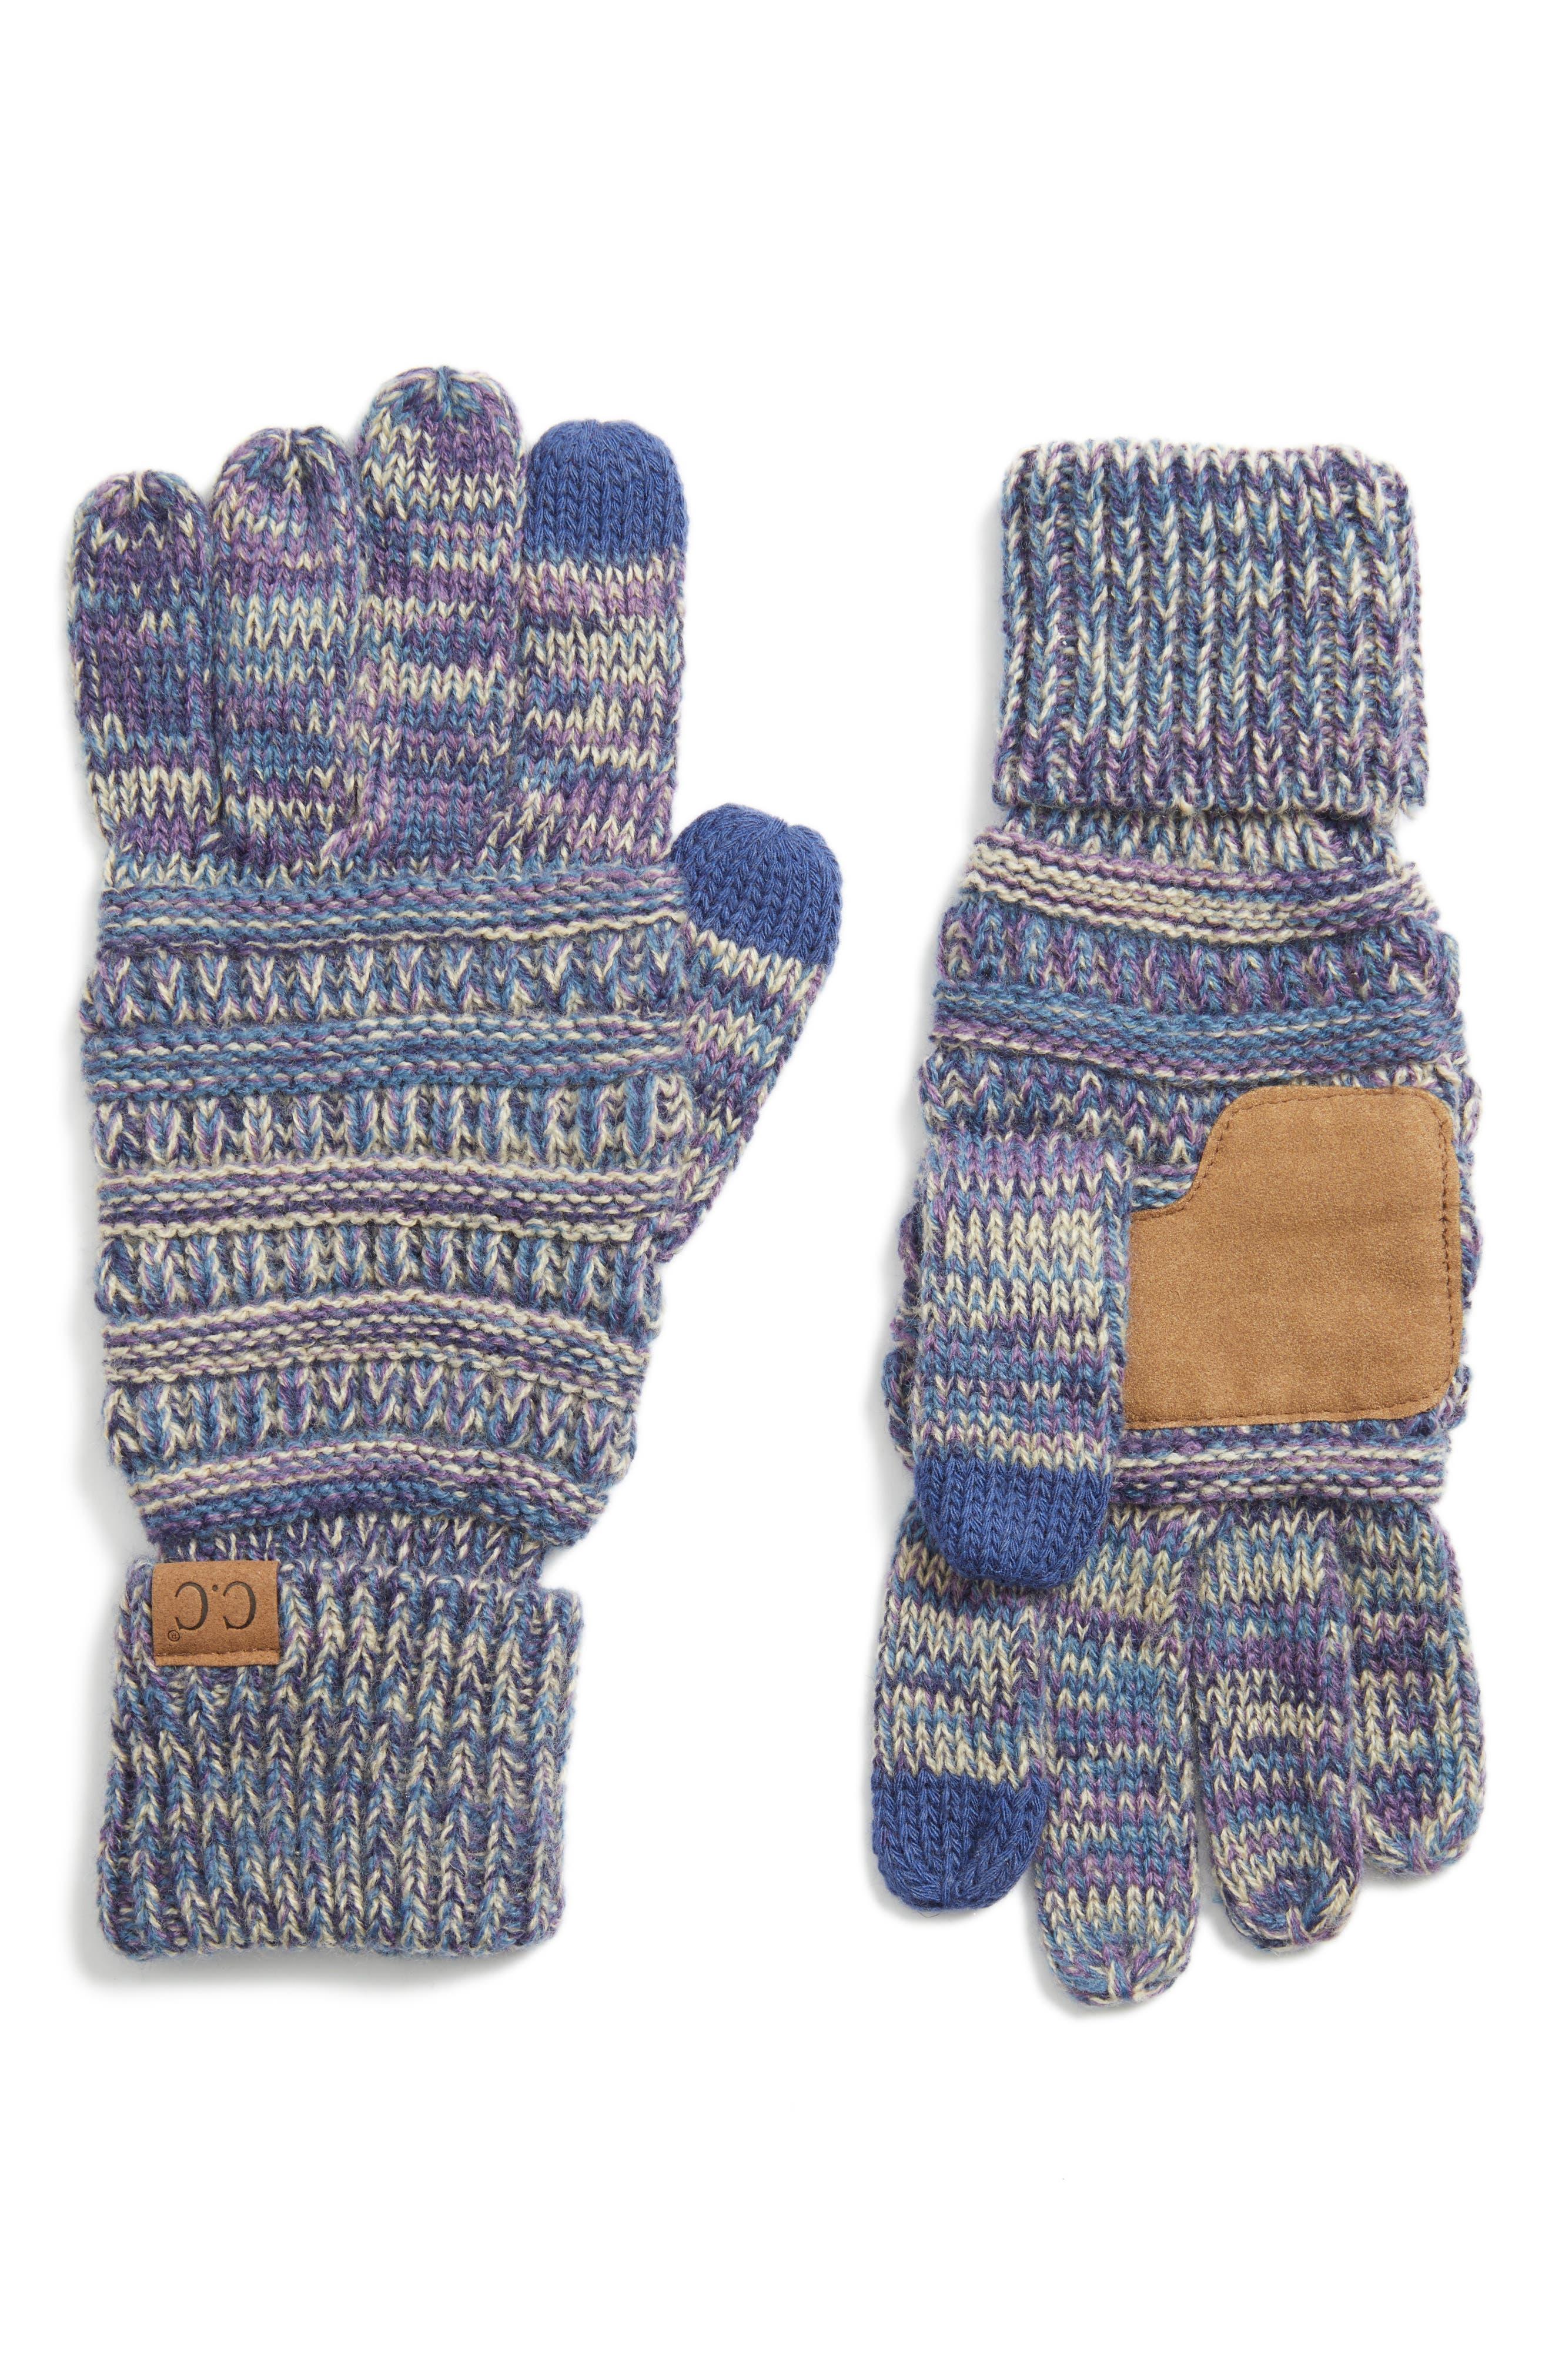 Knit Tech Gloves,                             Main thumbnail 1, color,                             Purple/ Dark Denim/ Beige